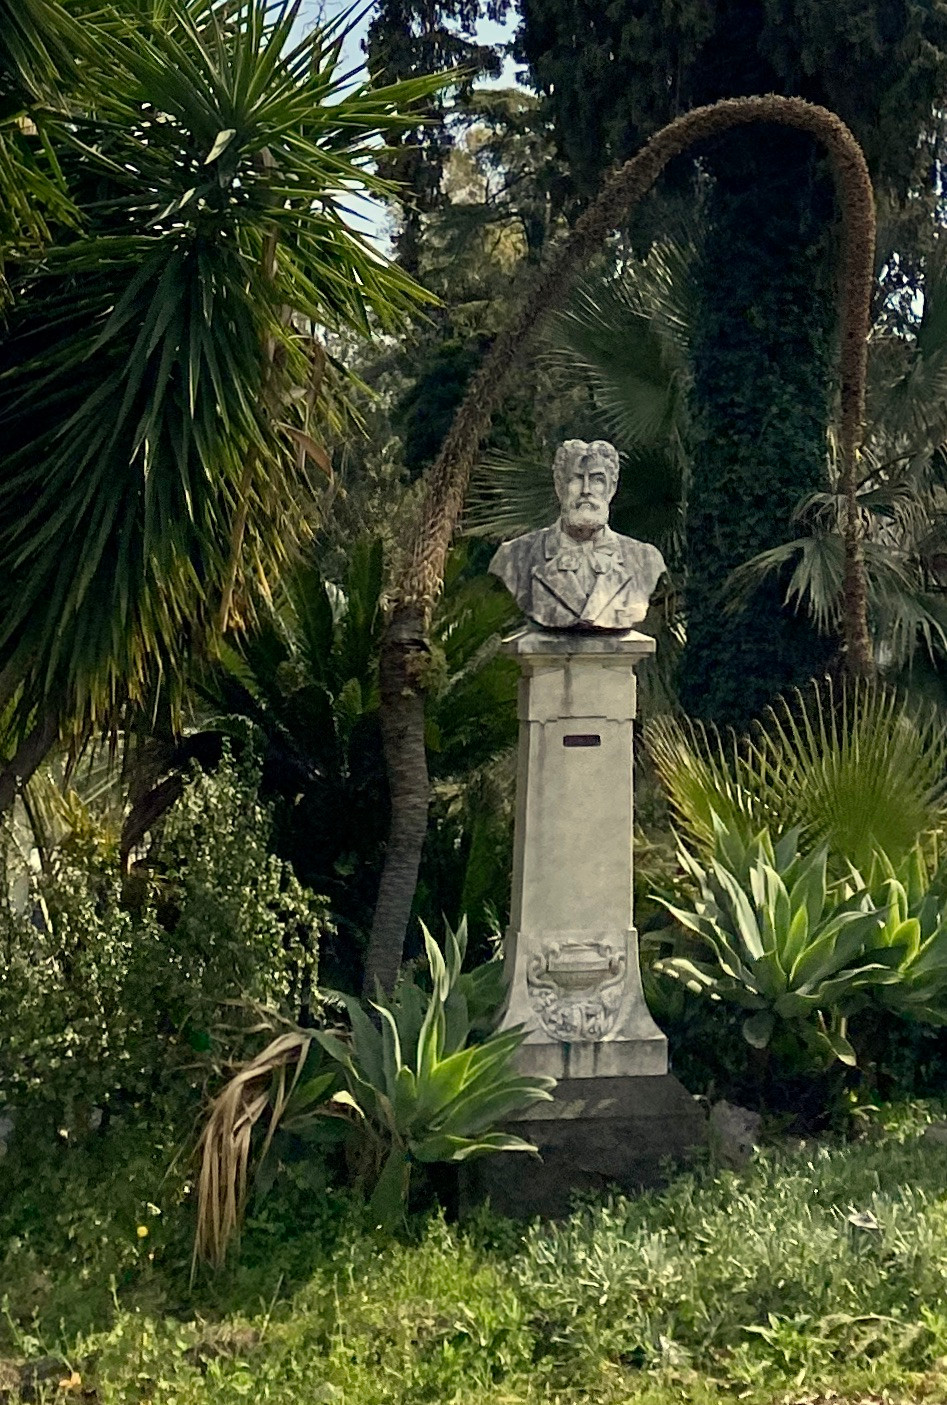 acireale-villa-belvedere-city-park-3